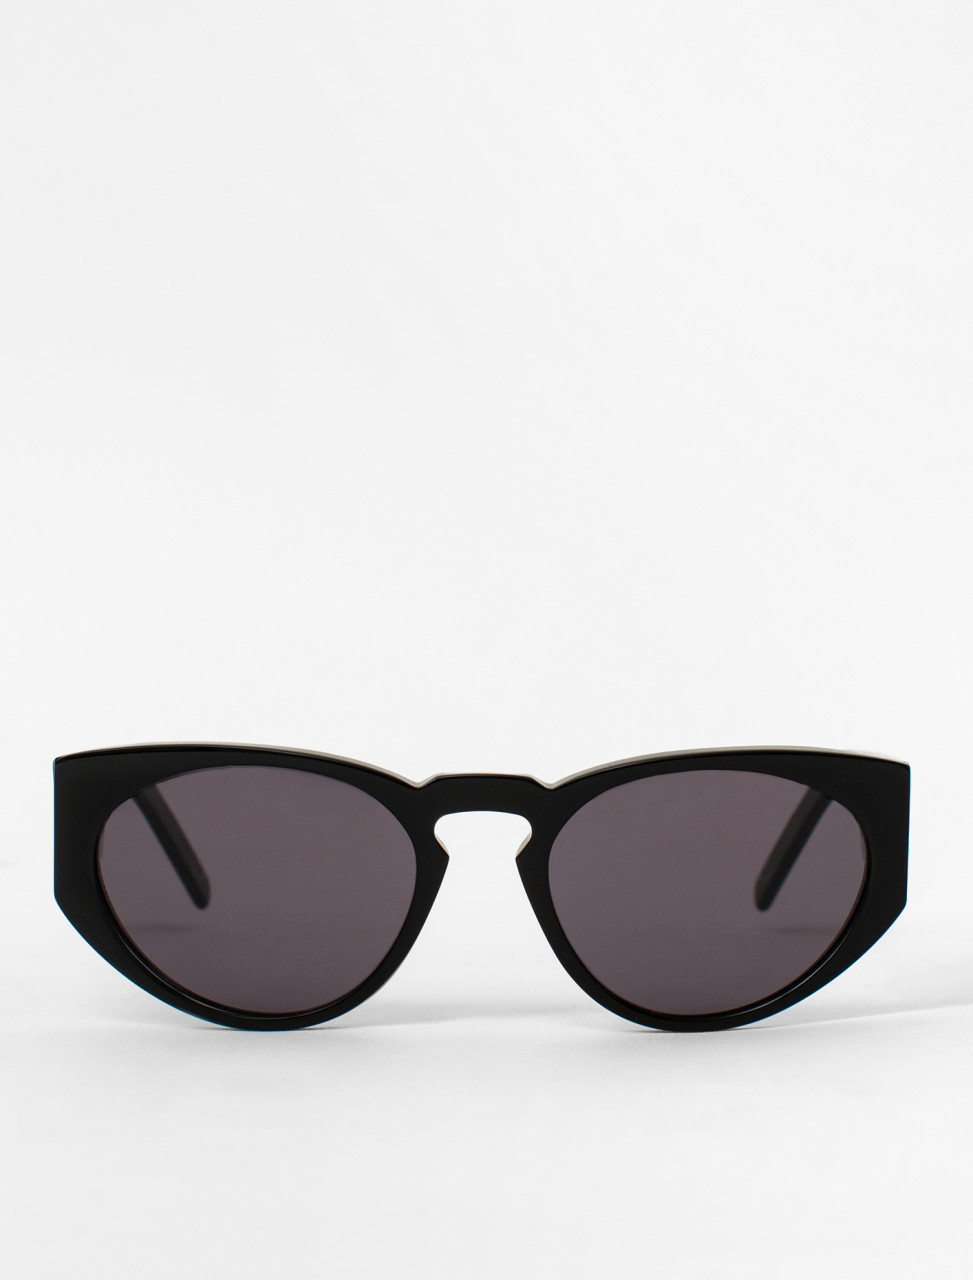 Goran Sunglasses